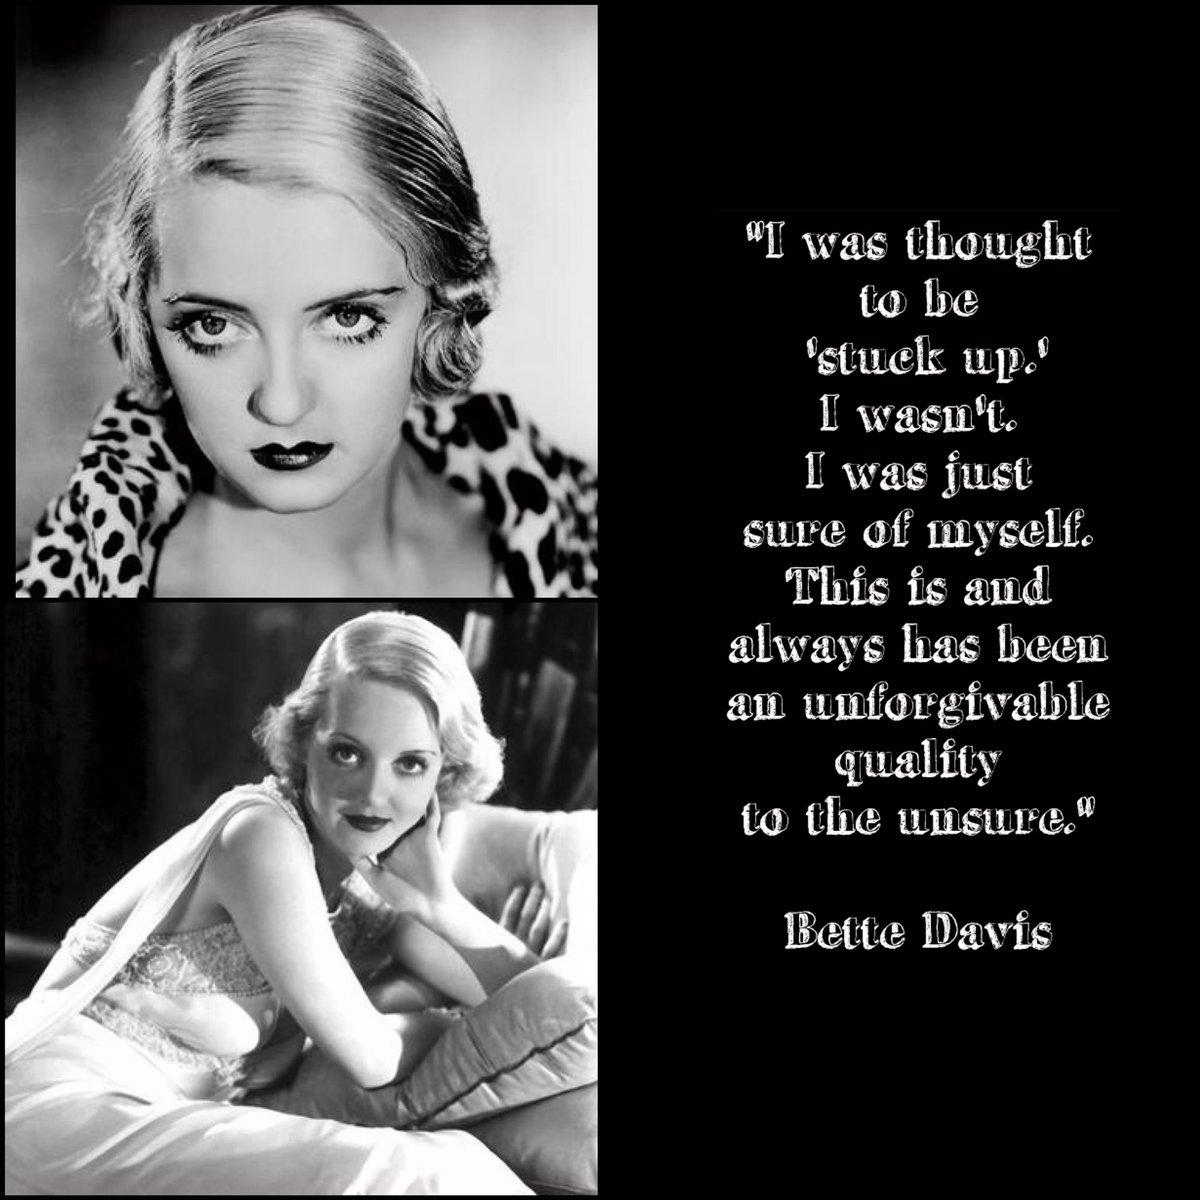 #WednesdayWisdom from Bette Davis #BetteDavis #Hollywoodglamour #FeudF...